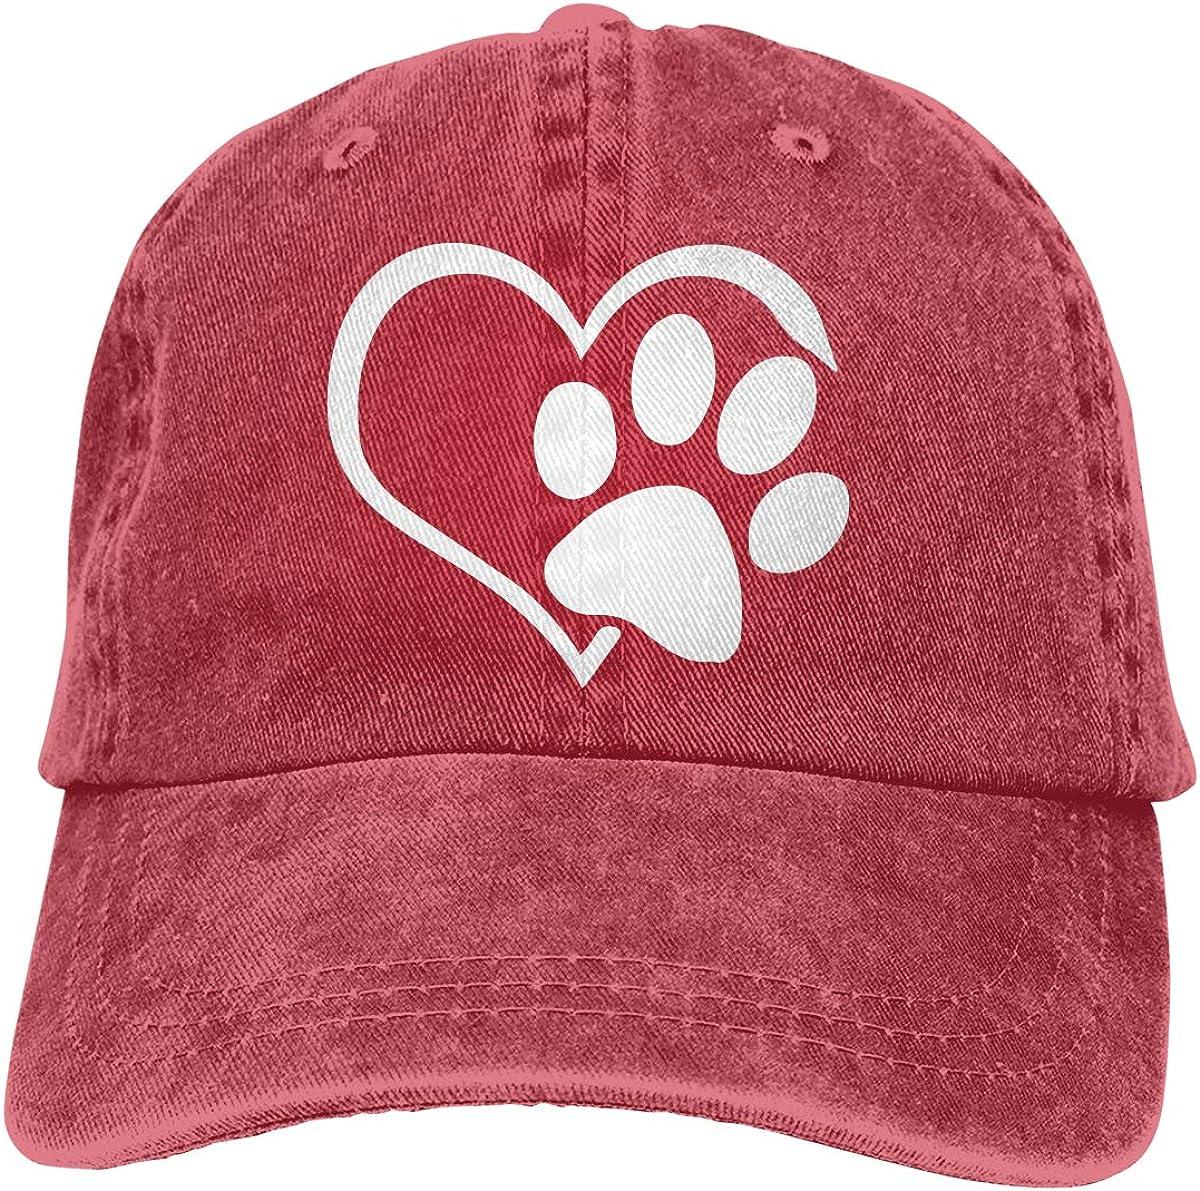 Animal Lover Dog Paw Adult Custom Jeans Outdoor Sports Hat Adjustable Baseball Cap